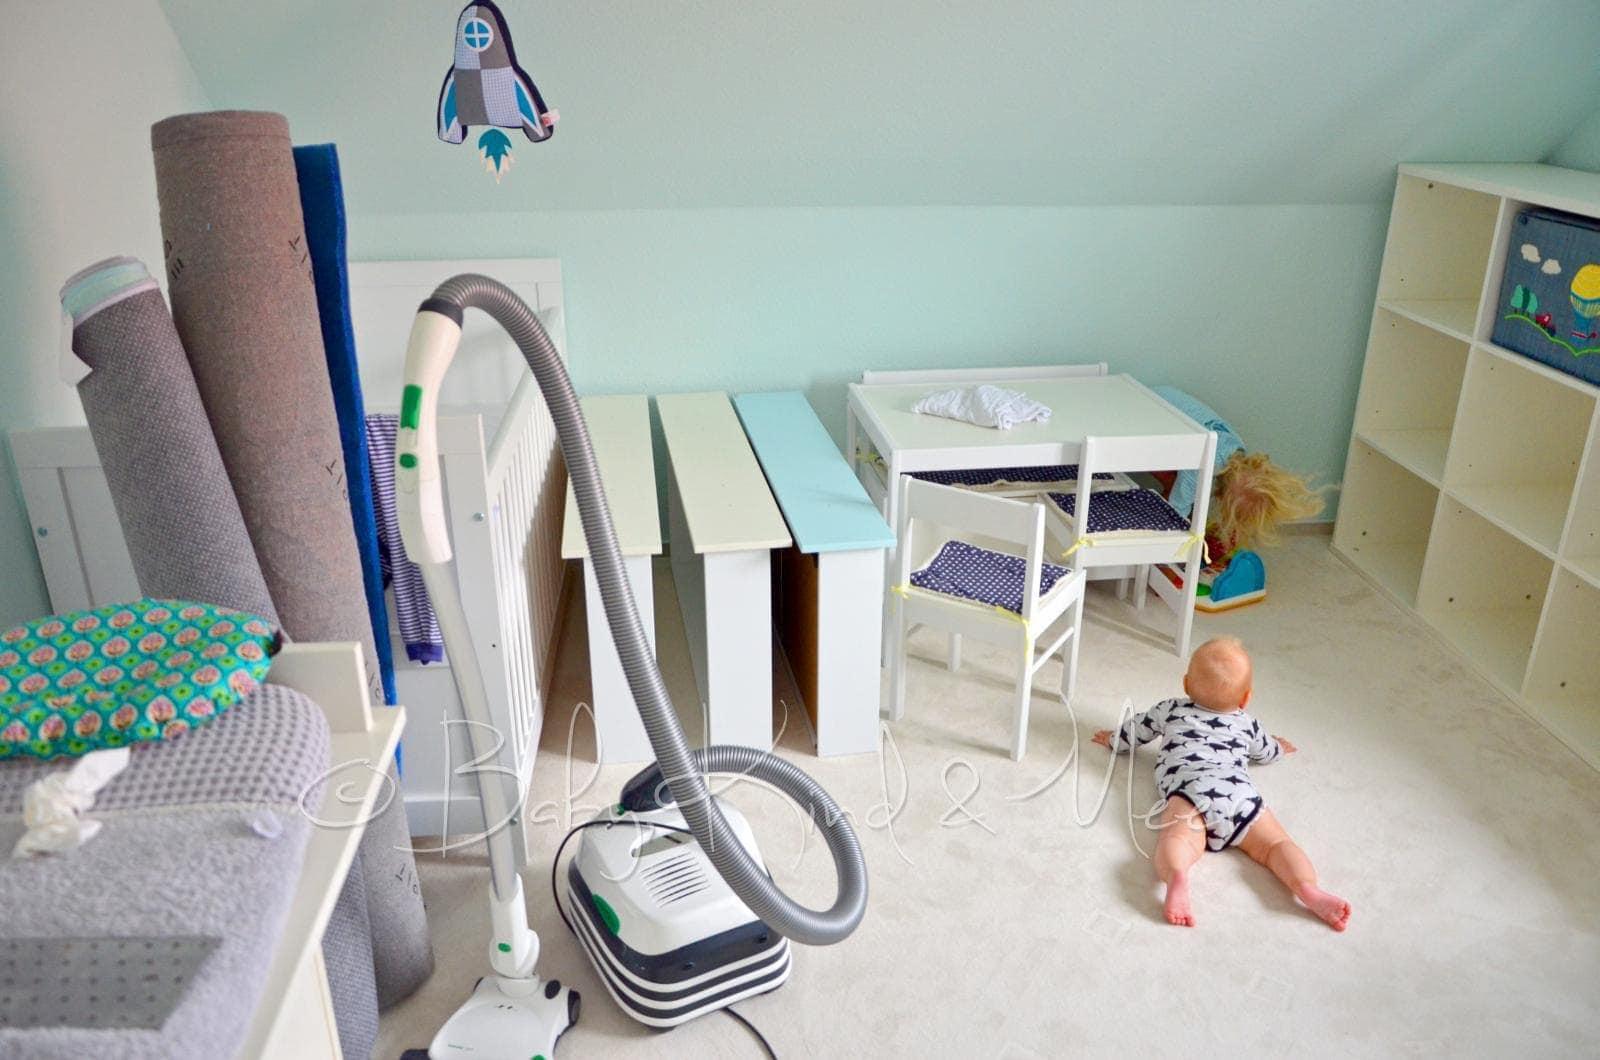 kinderzimmer wieviel quadratmeter bibkunstschuur. Black Bedroom Furniture Sets. Home Design Ideas